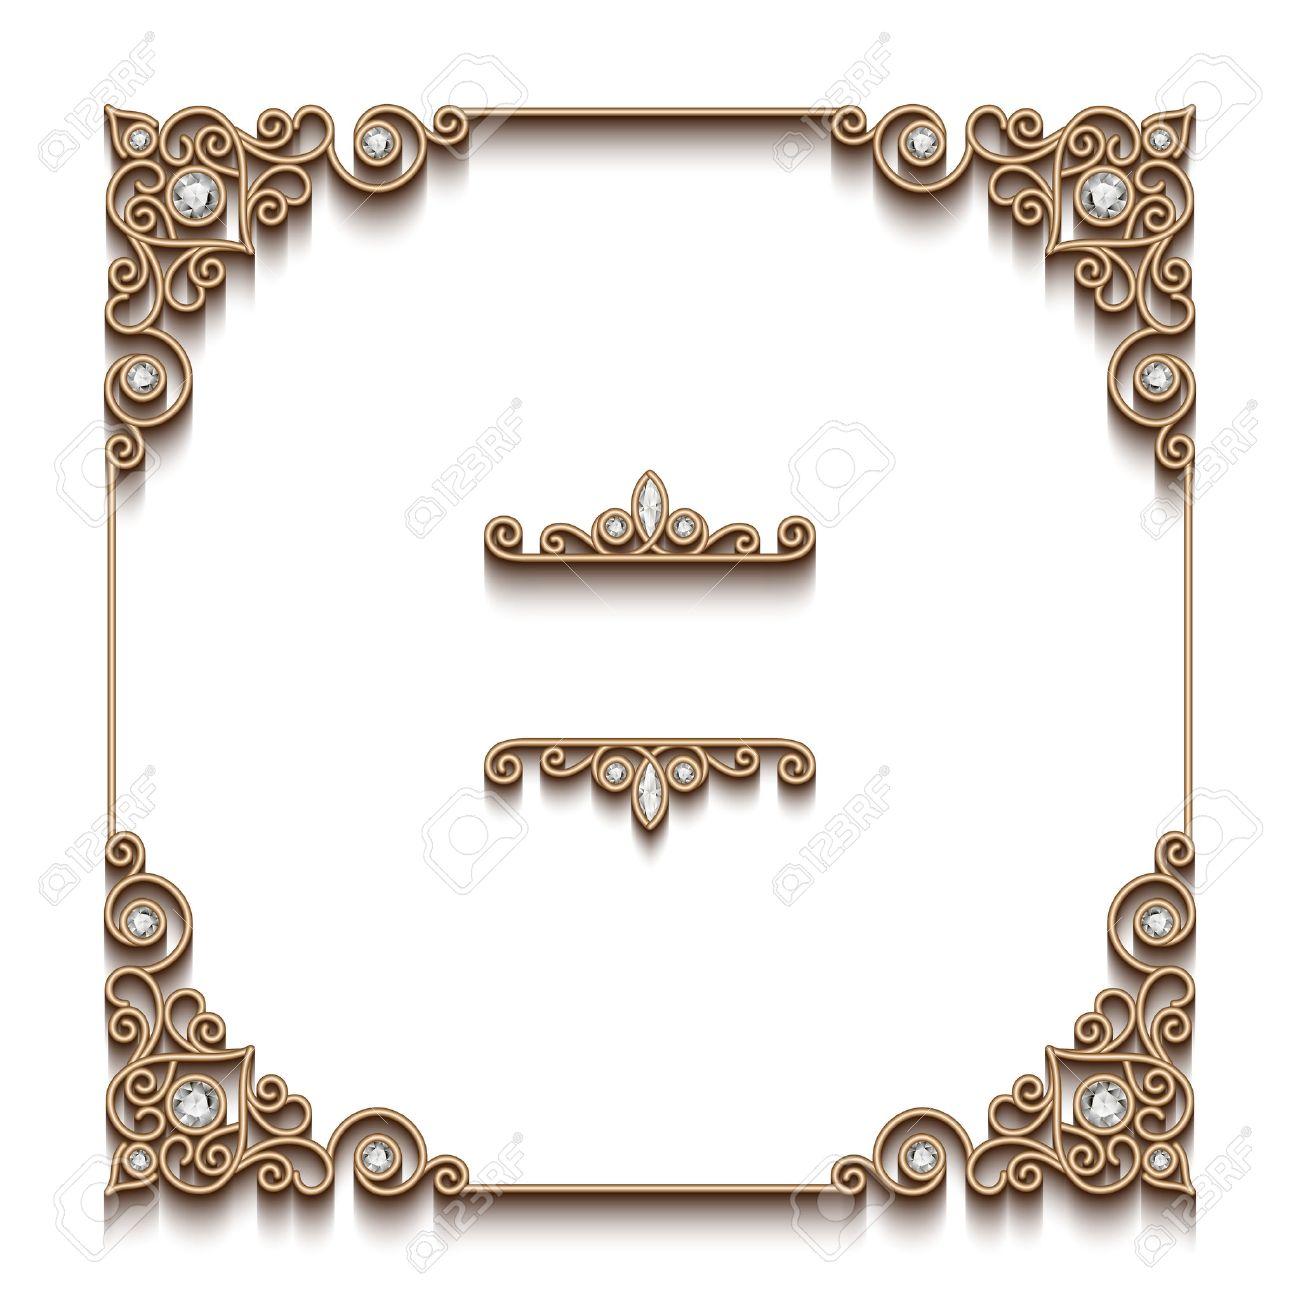 Vintage gold background, elegant square frame, antique jewelry vignette on white - 46961059